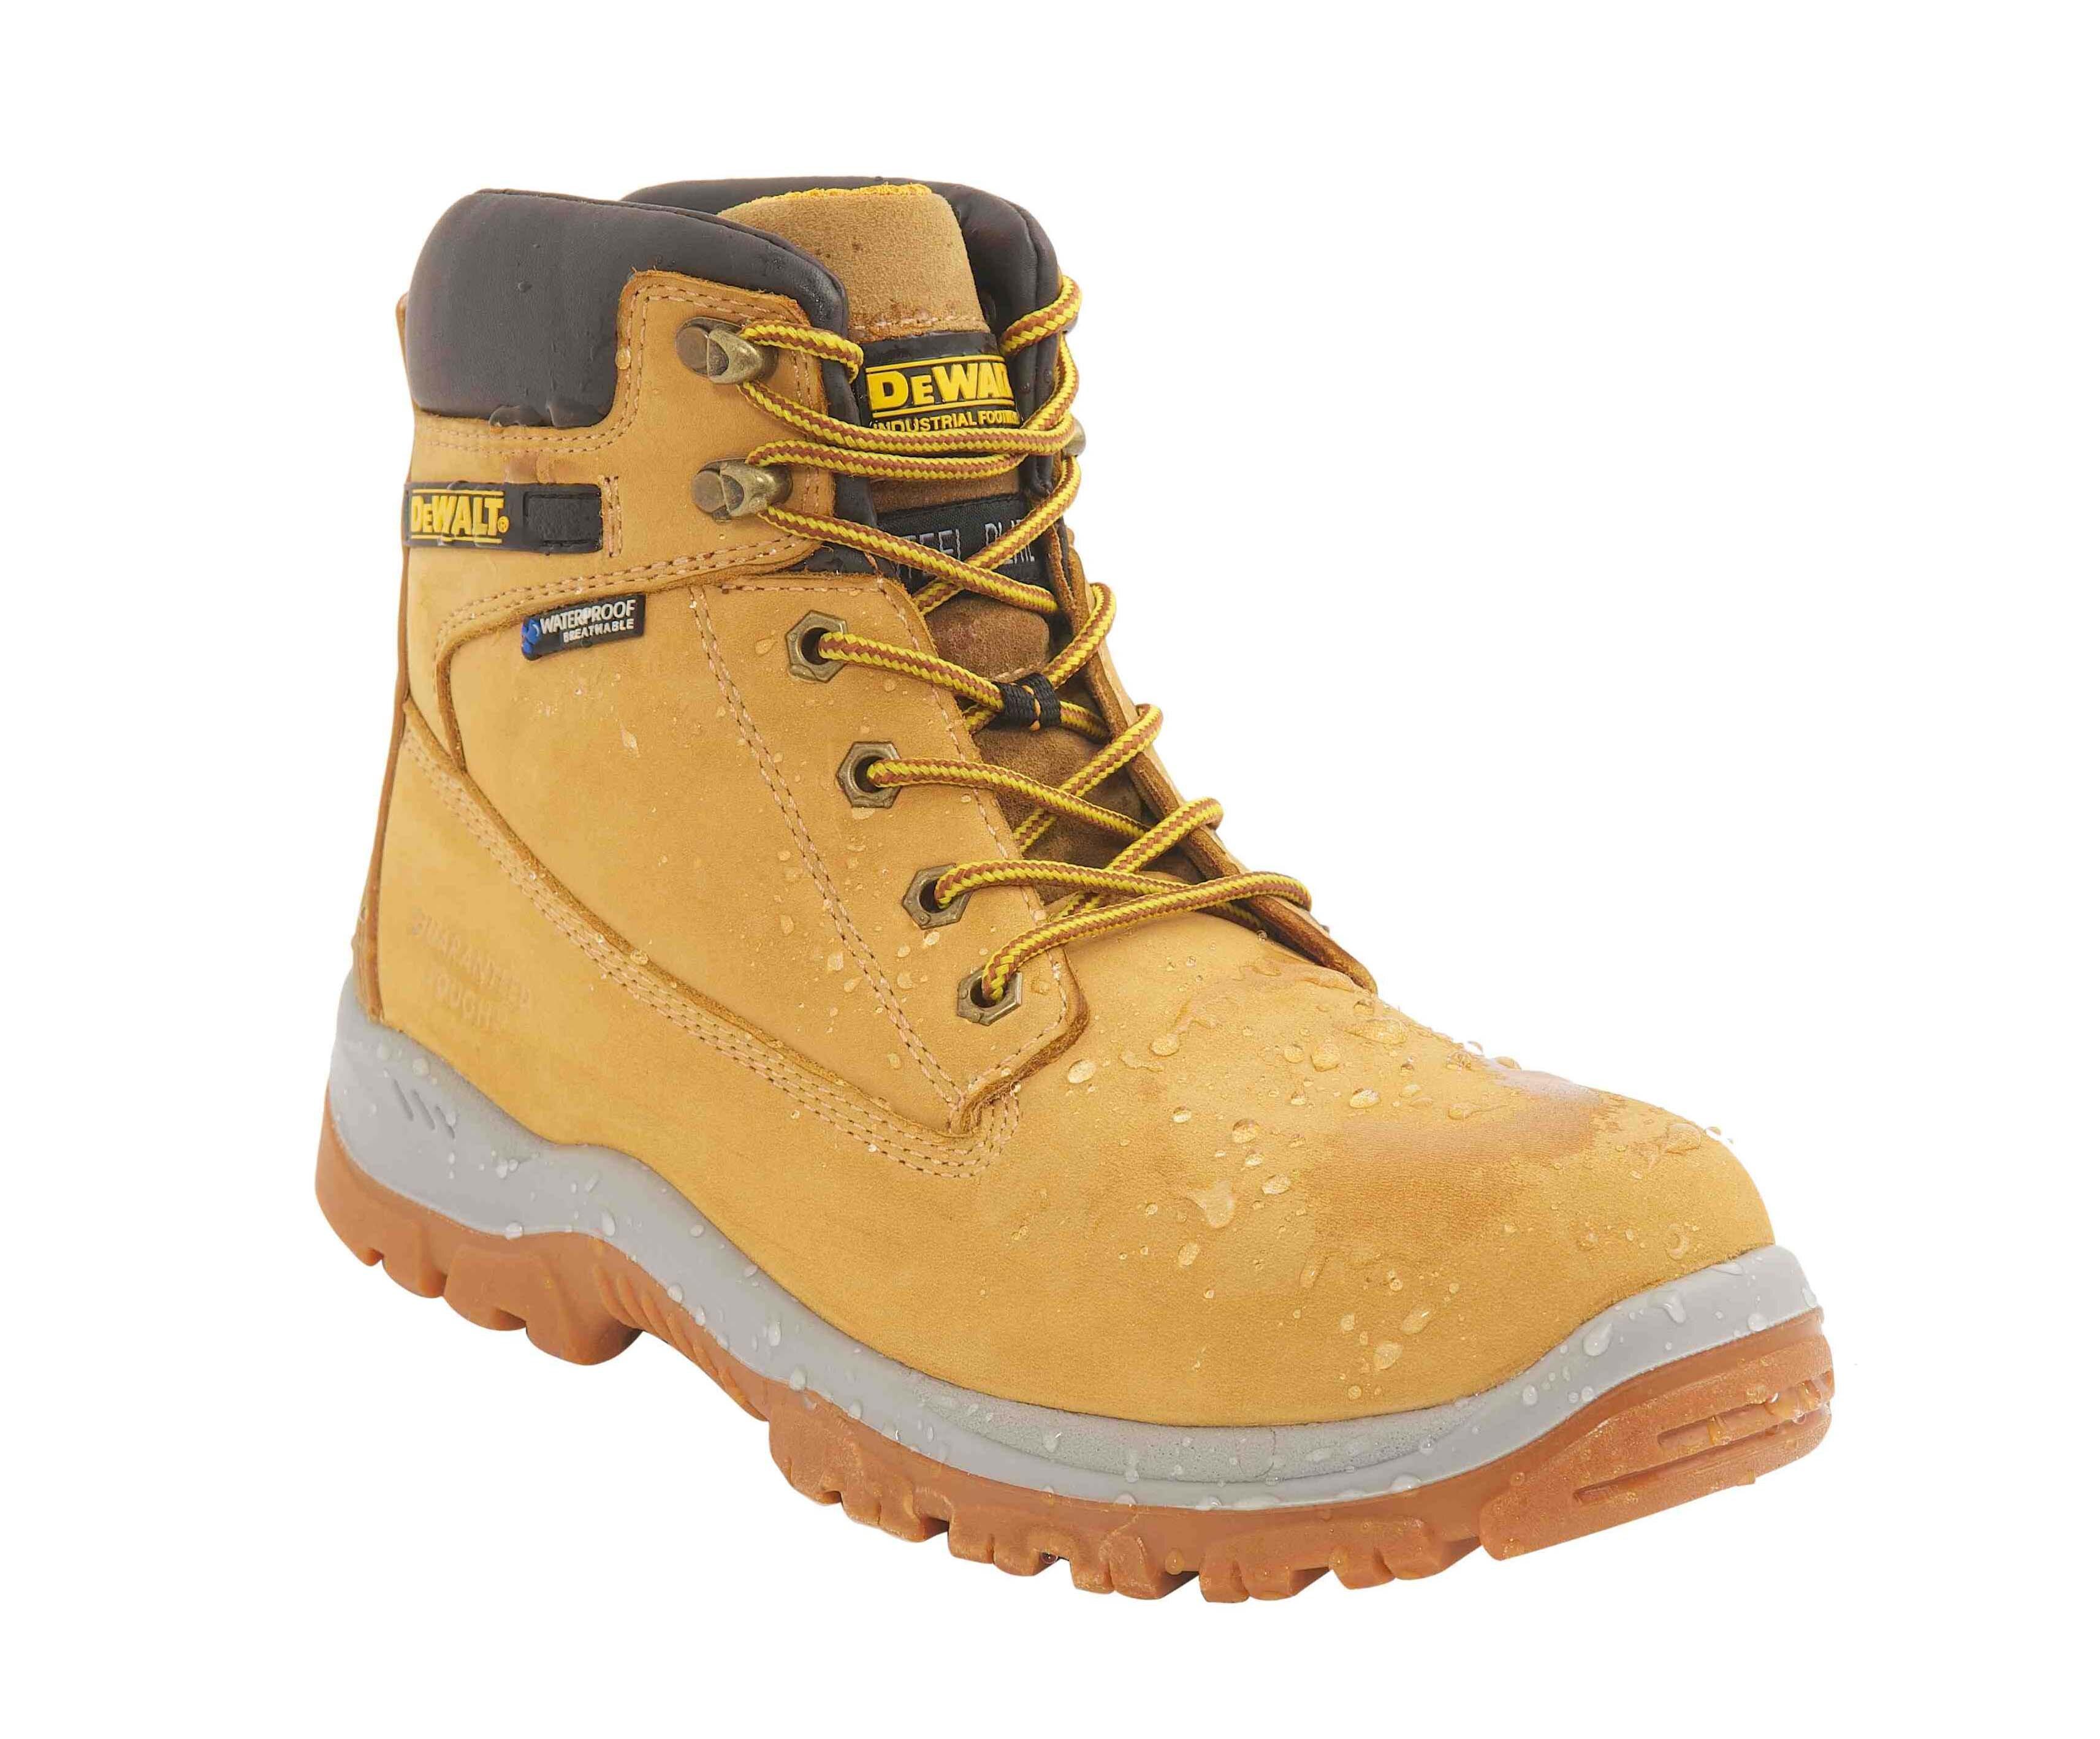 DeWALT Titanium Hiker Waterproof Boot Honey S3 WR SRA